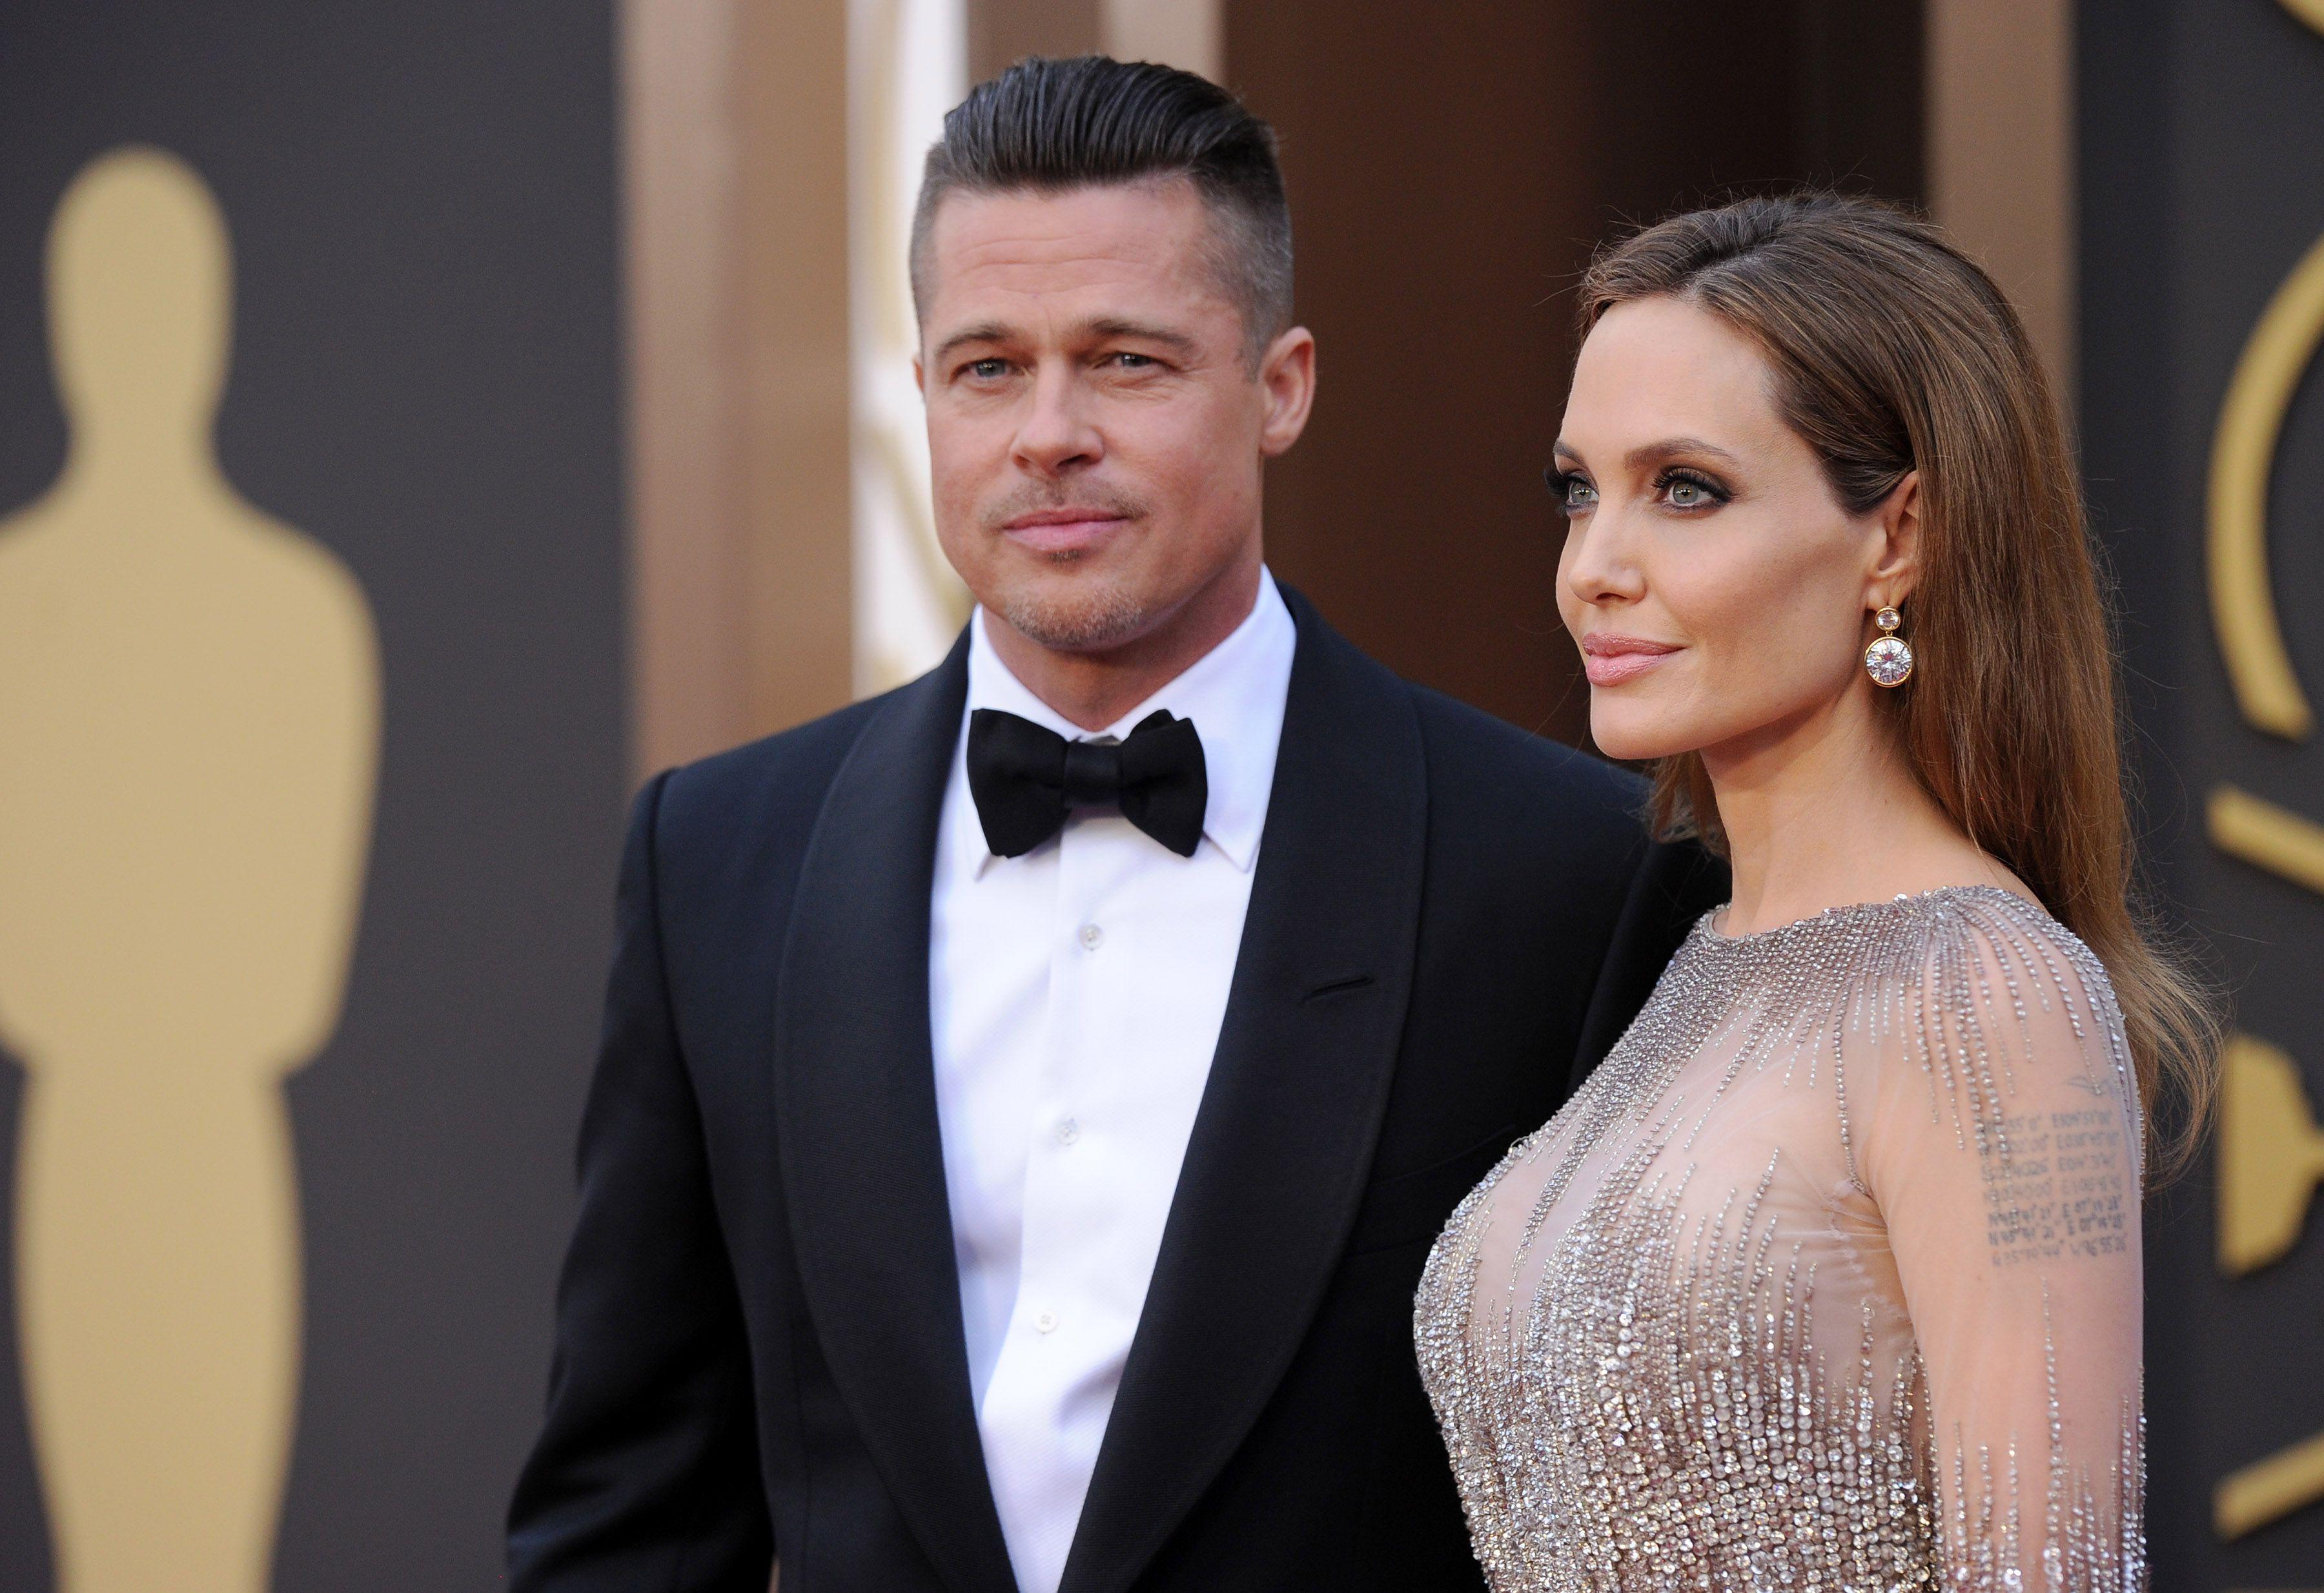 Joulie angelina Angelina Jolie